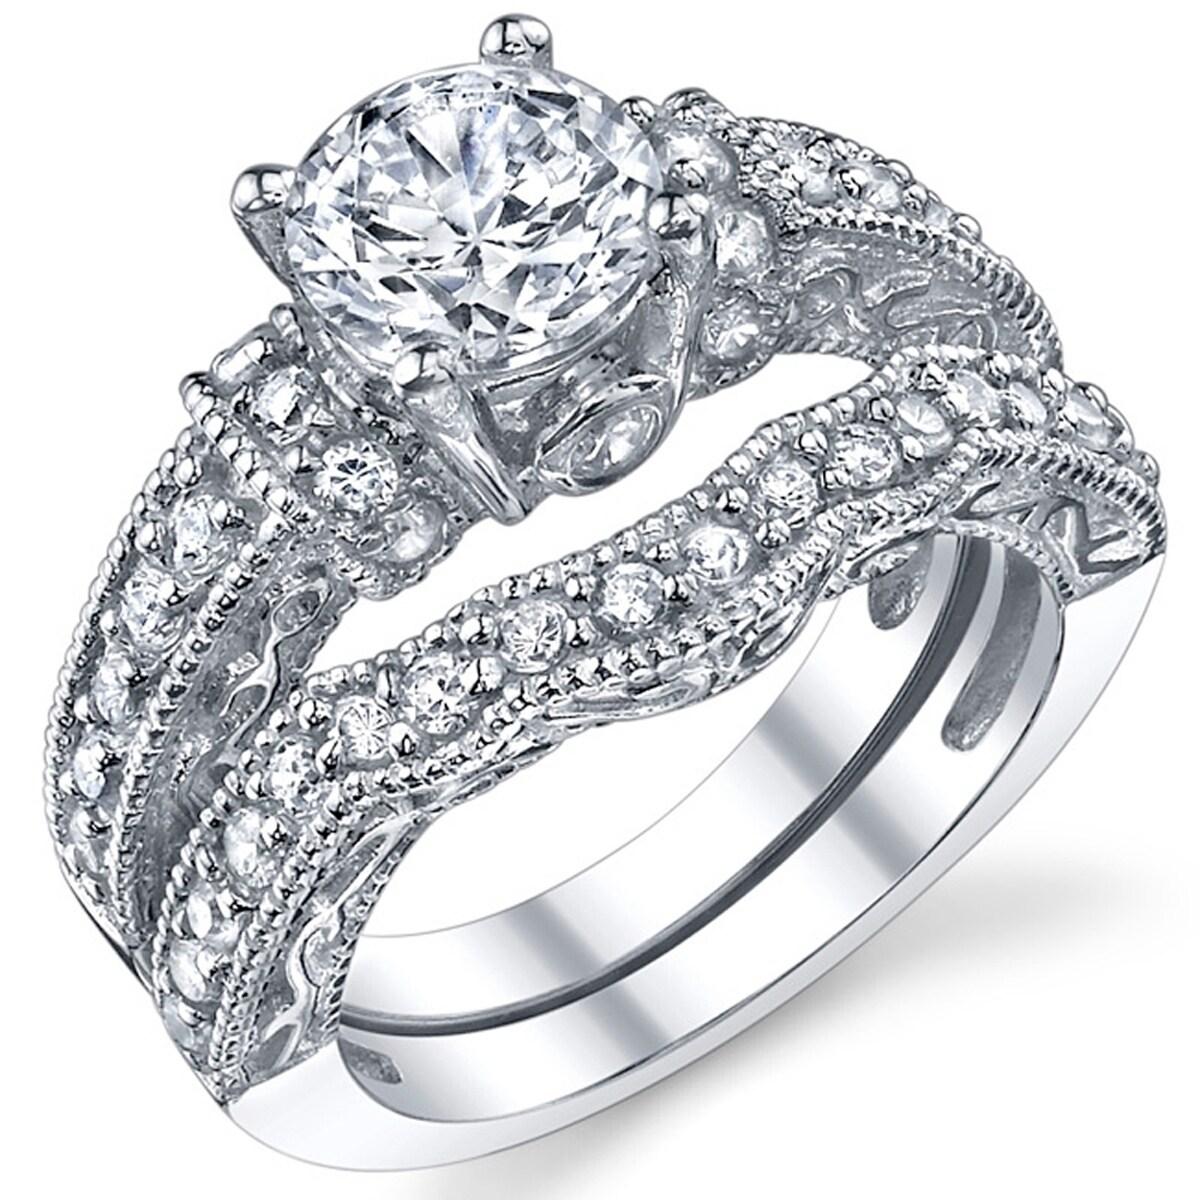 DiamondJewelryNY Sterling Silver St Rachel Pendant